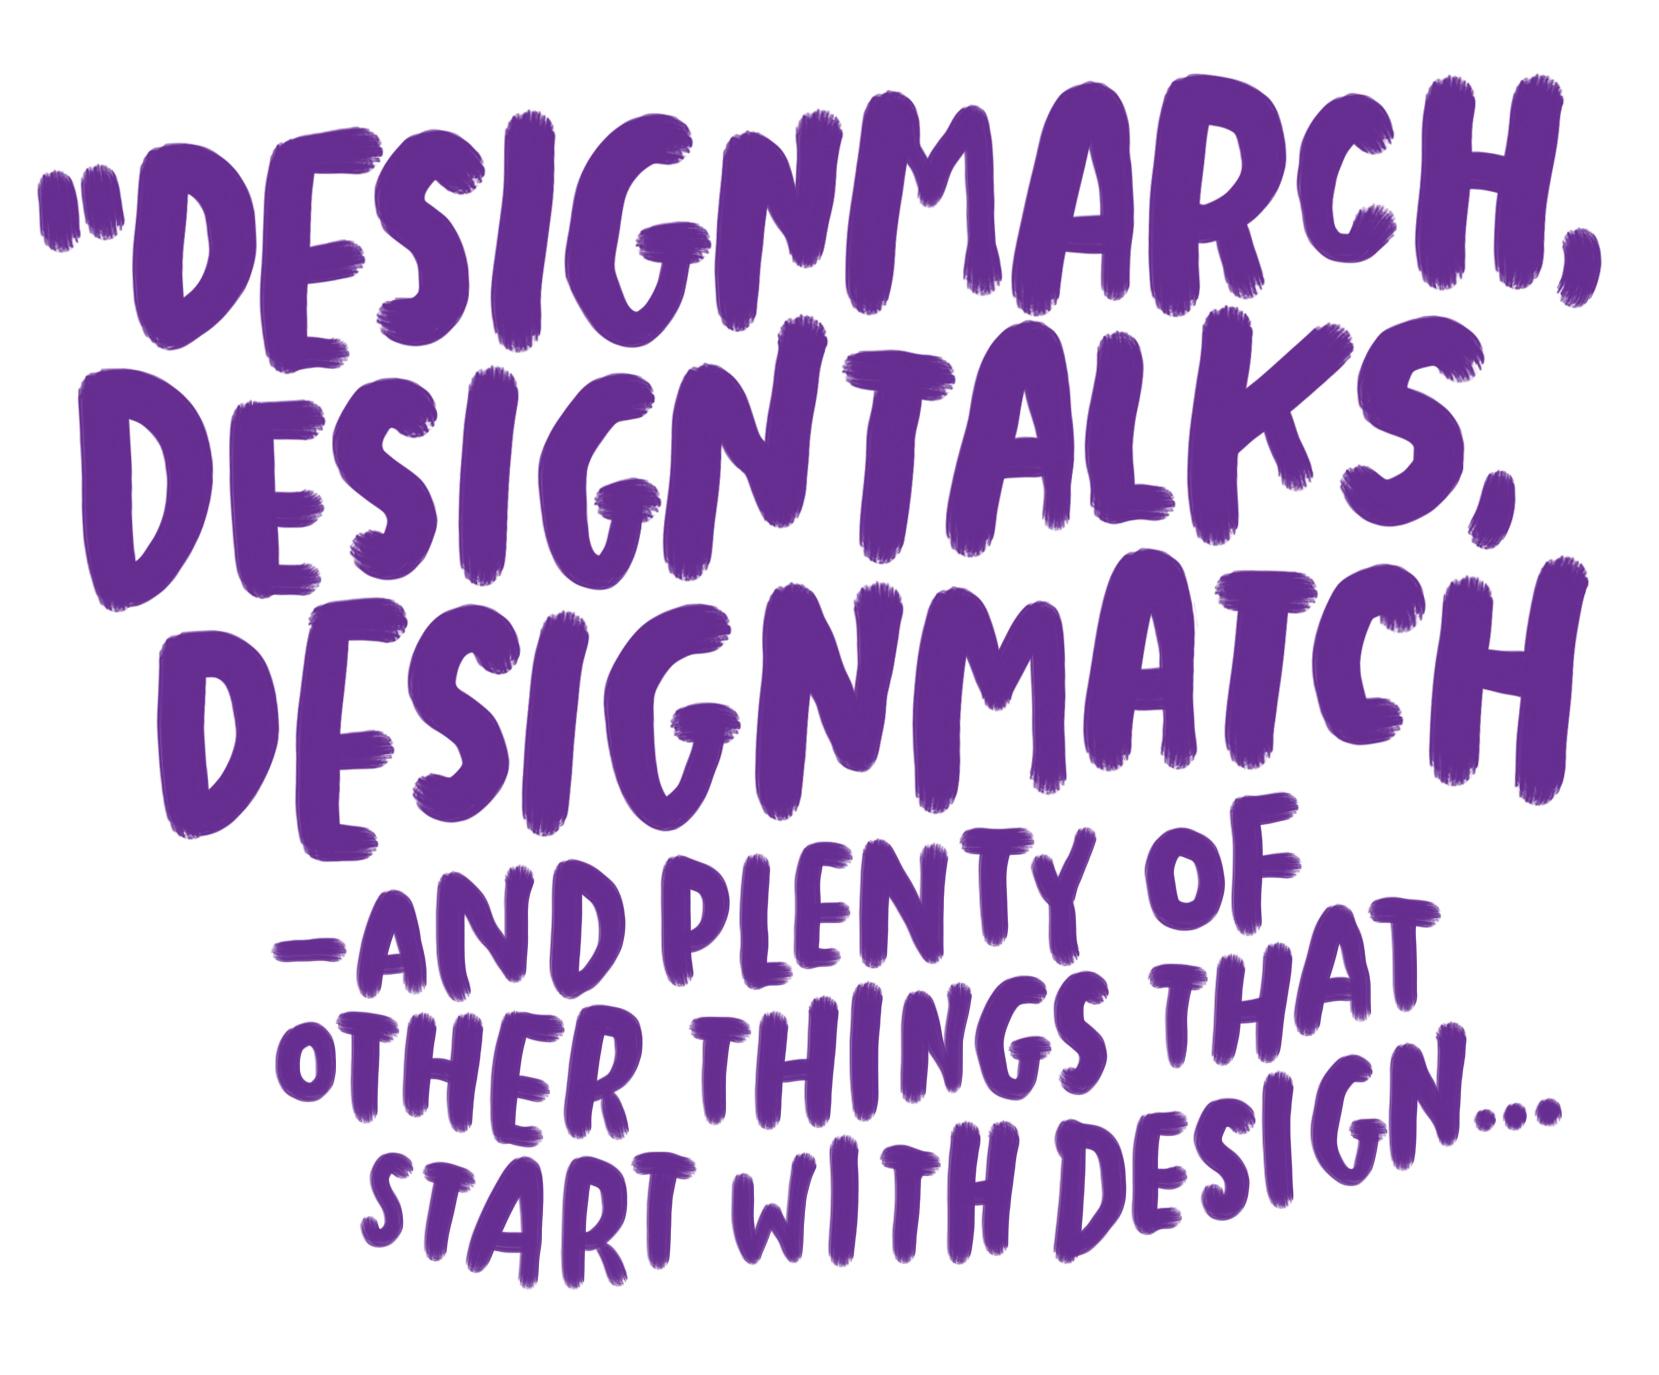 Design+a+March+brand+identity+|+tomasdottir.+|+logo+design,+pattern+design,+online+marketing,+festival+design,+branding,+illustration,+modern,+copywriting+design